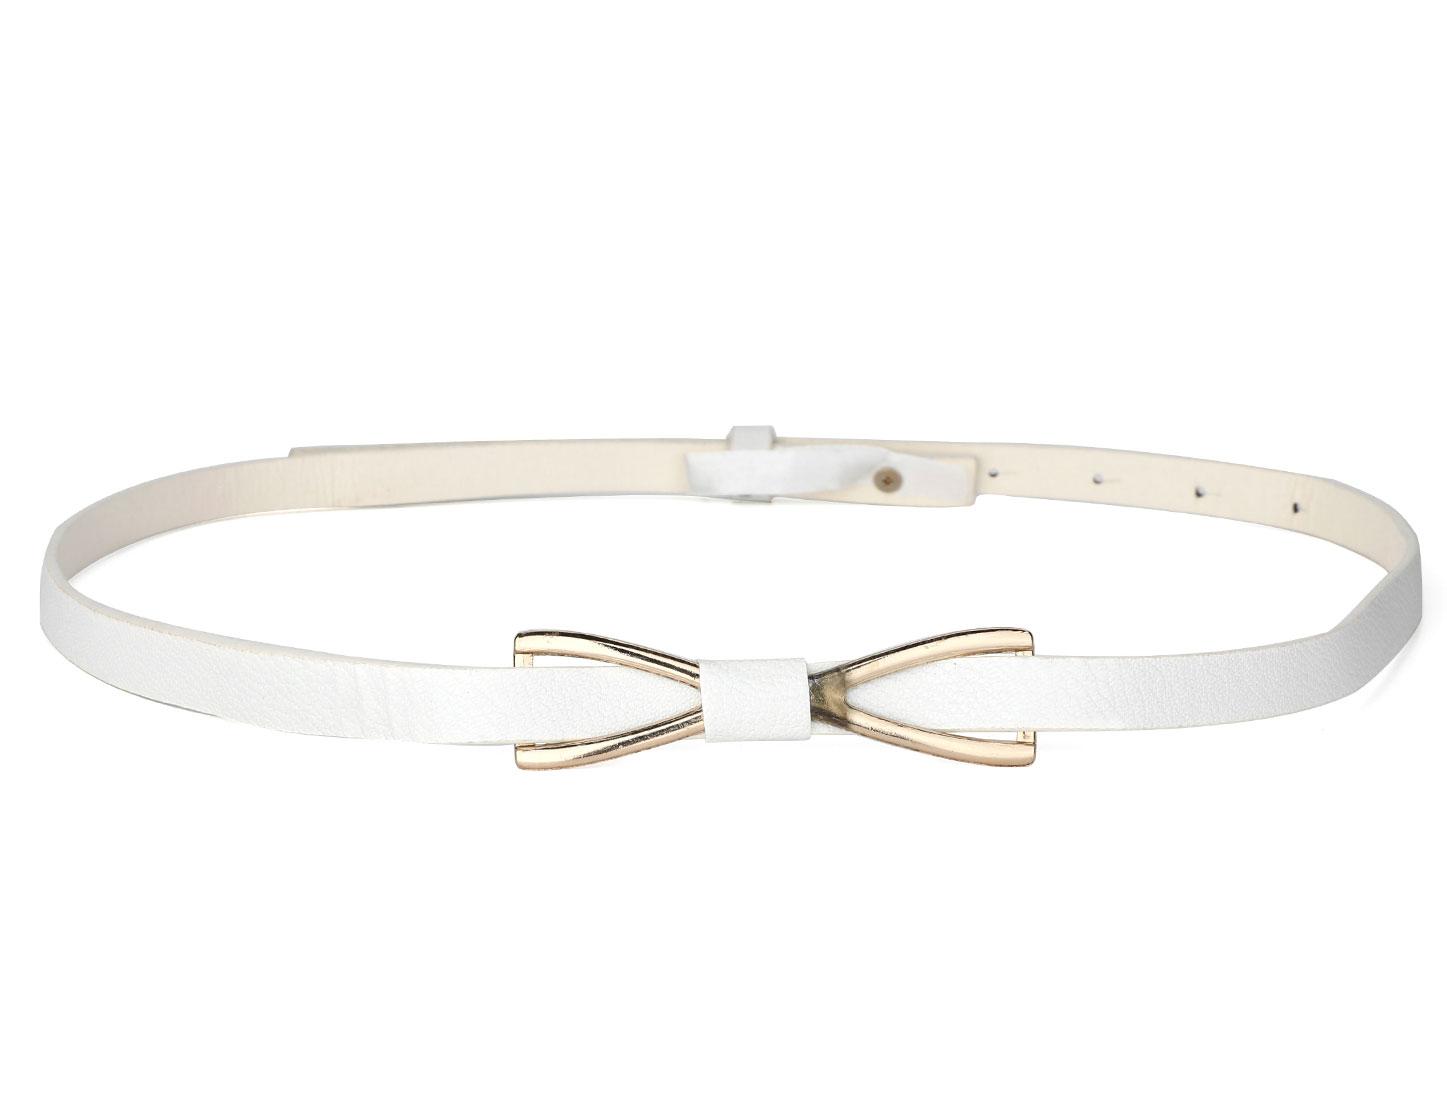 Women Press Buckle Metallic Bowknot Decor Faux Leather Skinny Waist Belt White